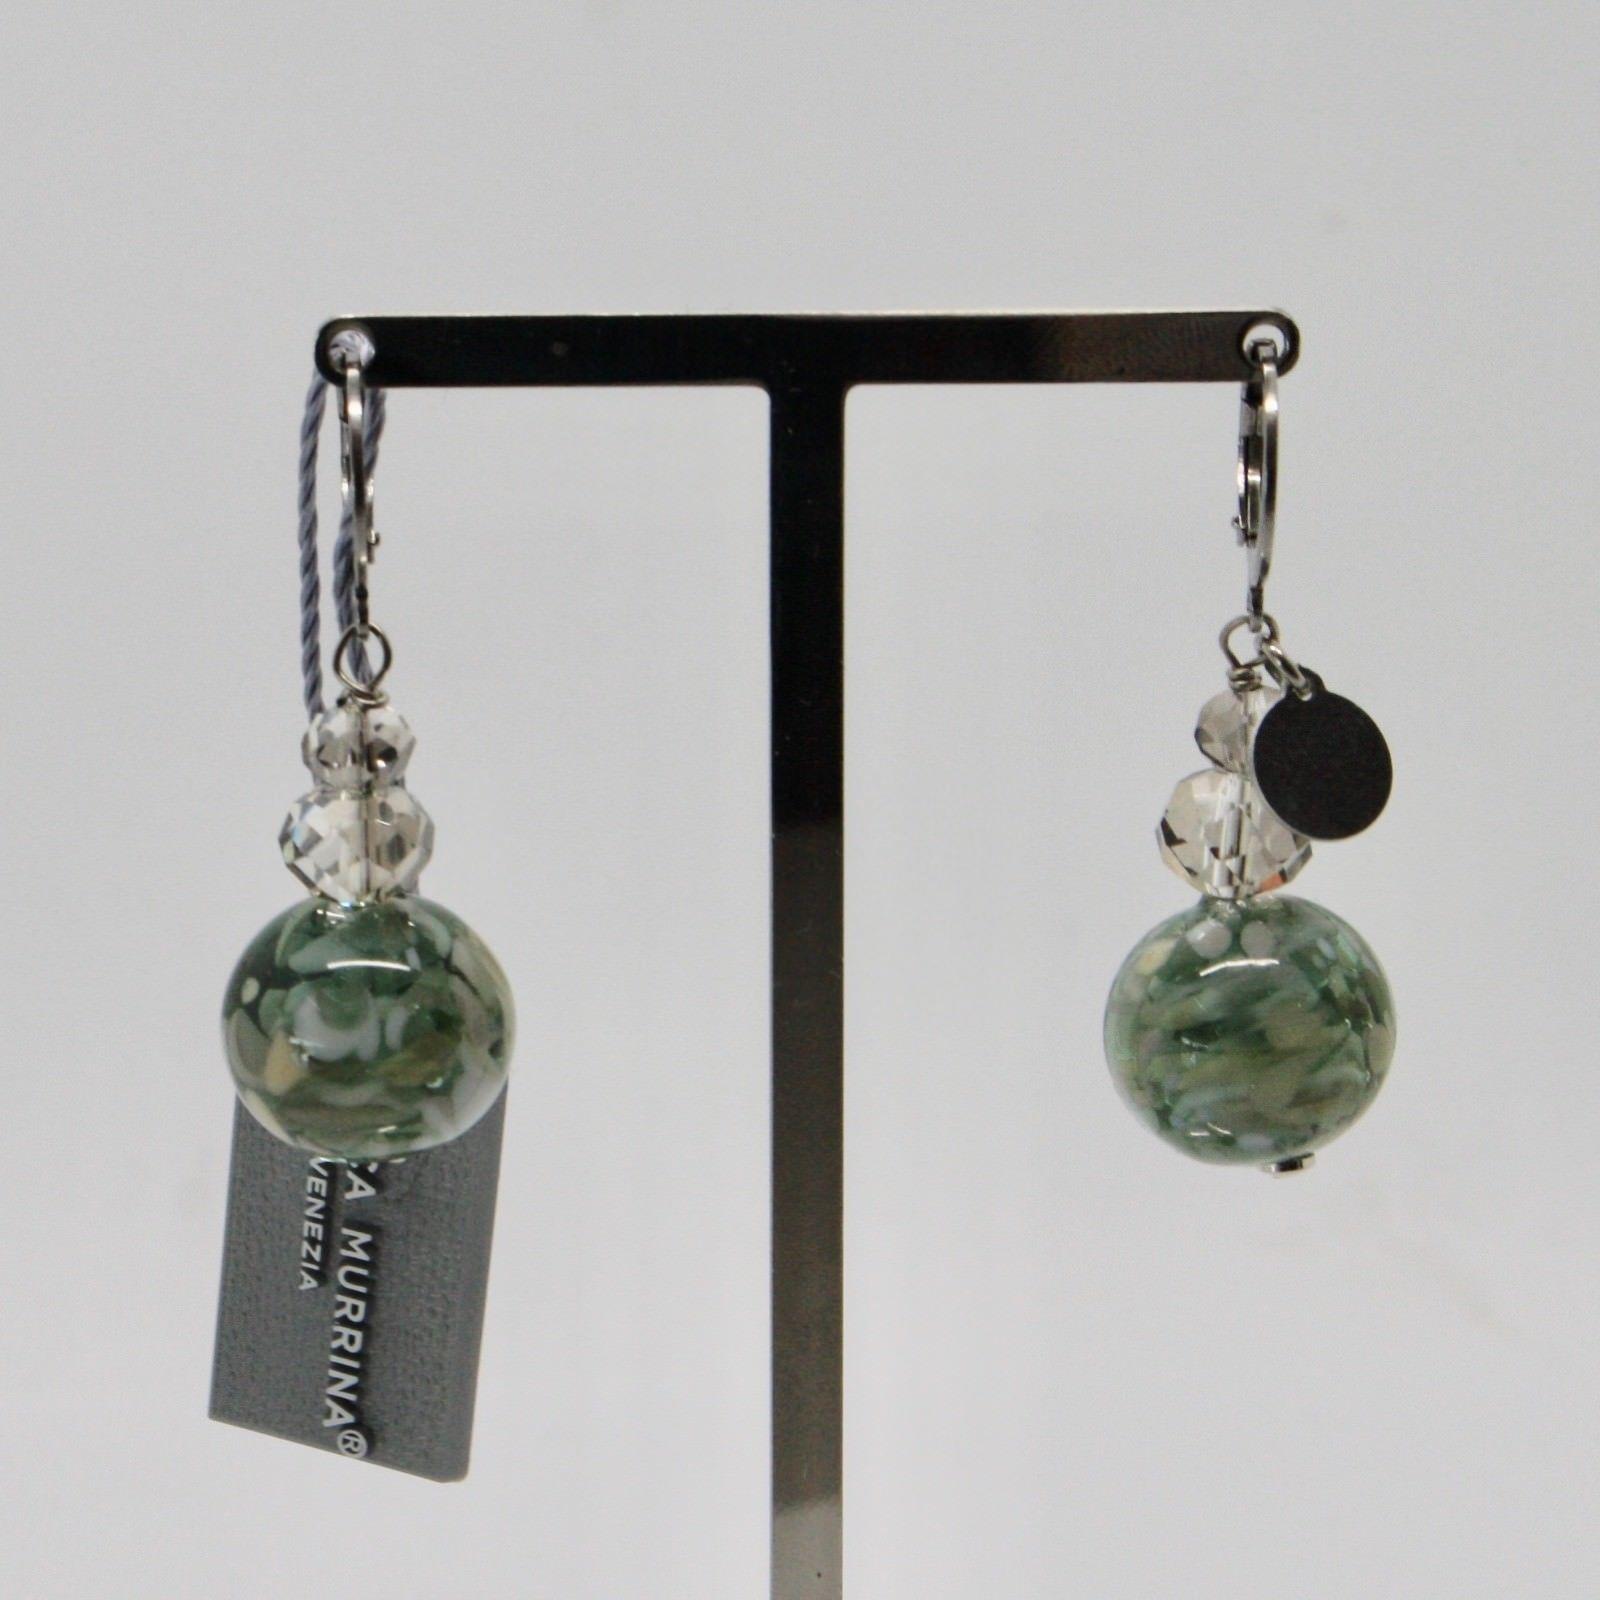 EARRINGS ANTICA MURRINA VENEZIA WITH MURANO GLASS GRAY BEIGE GREEN OR584A34